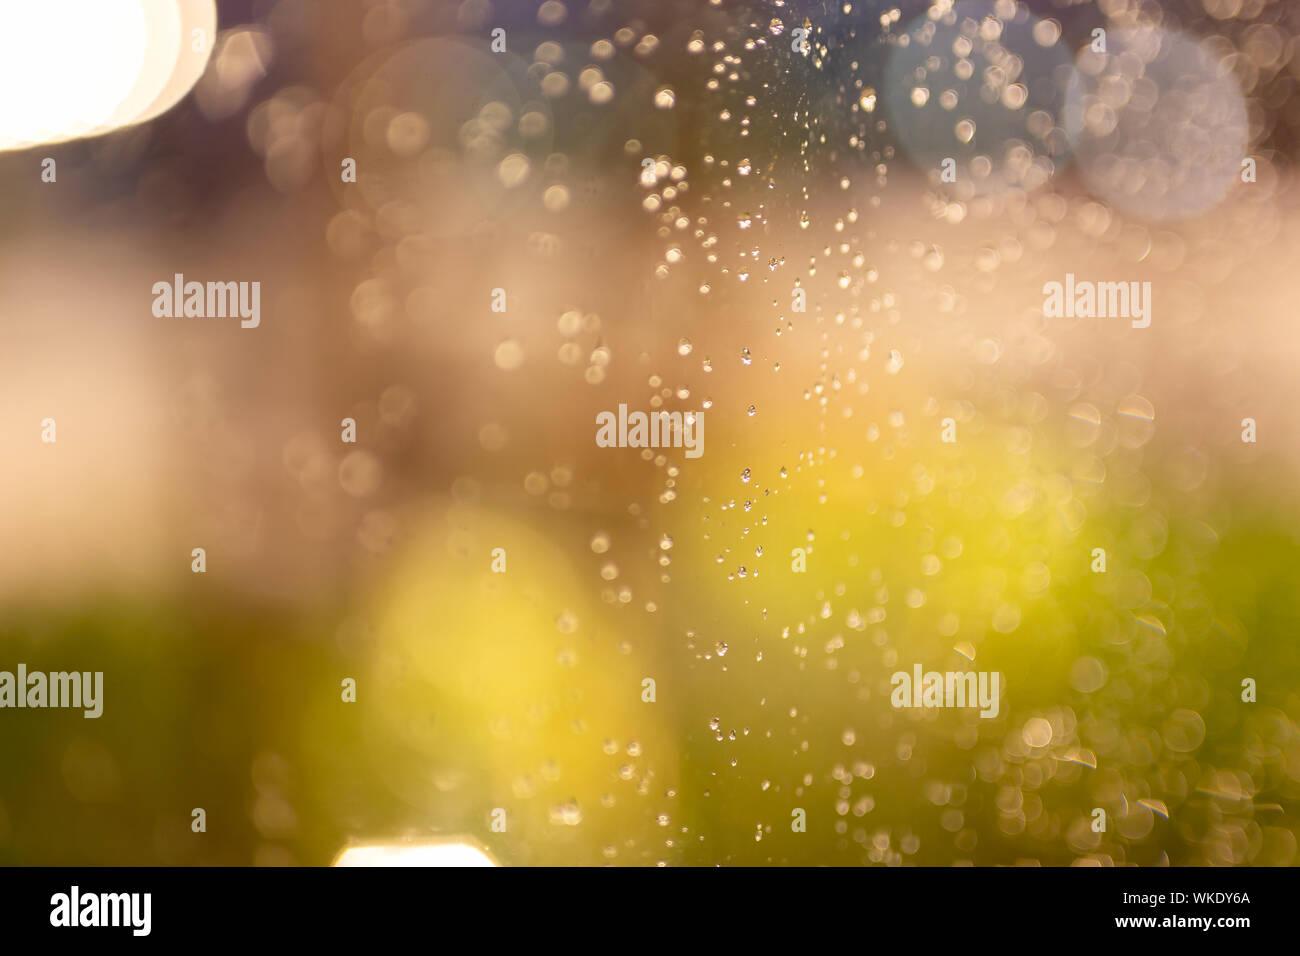 Water Rain Drops On Window Glass With Colorful Bokeh